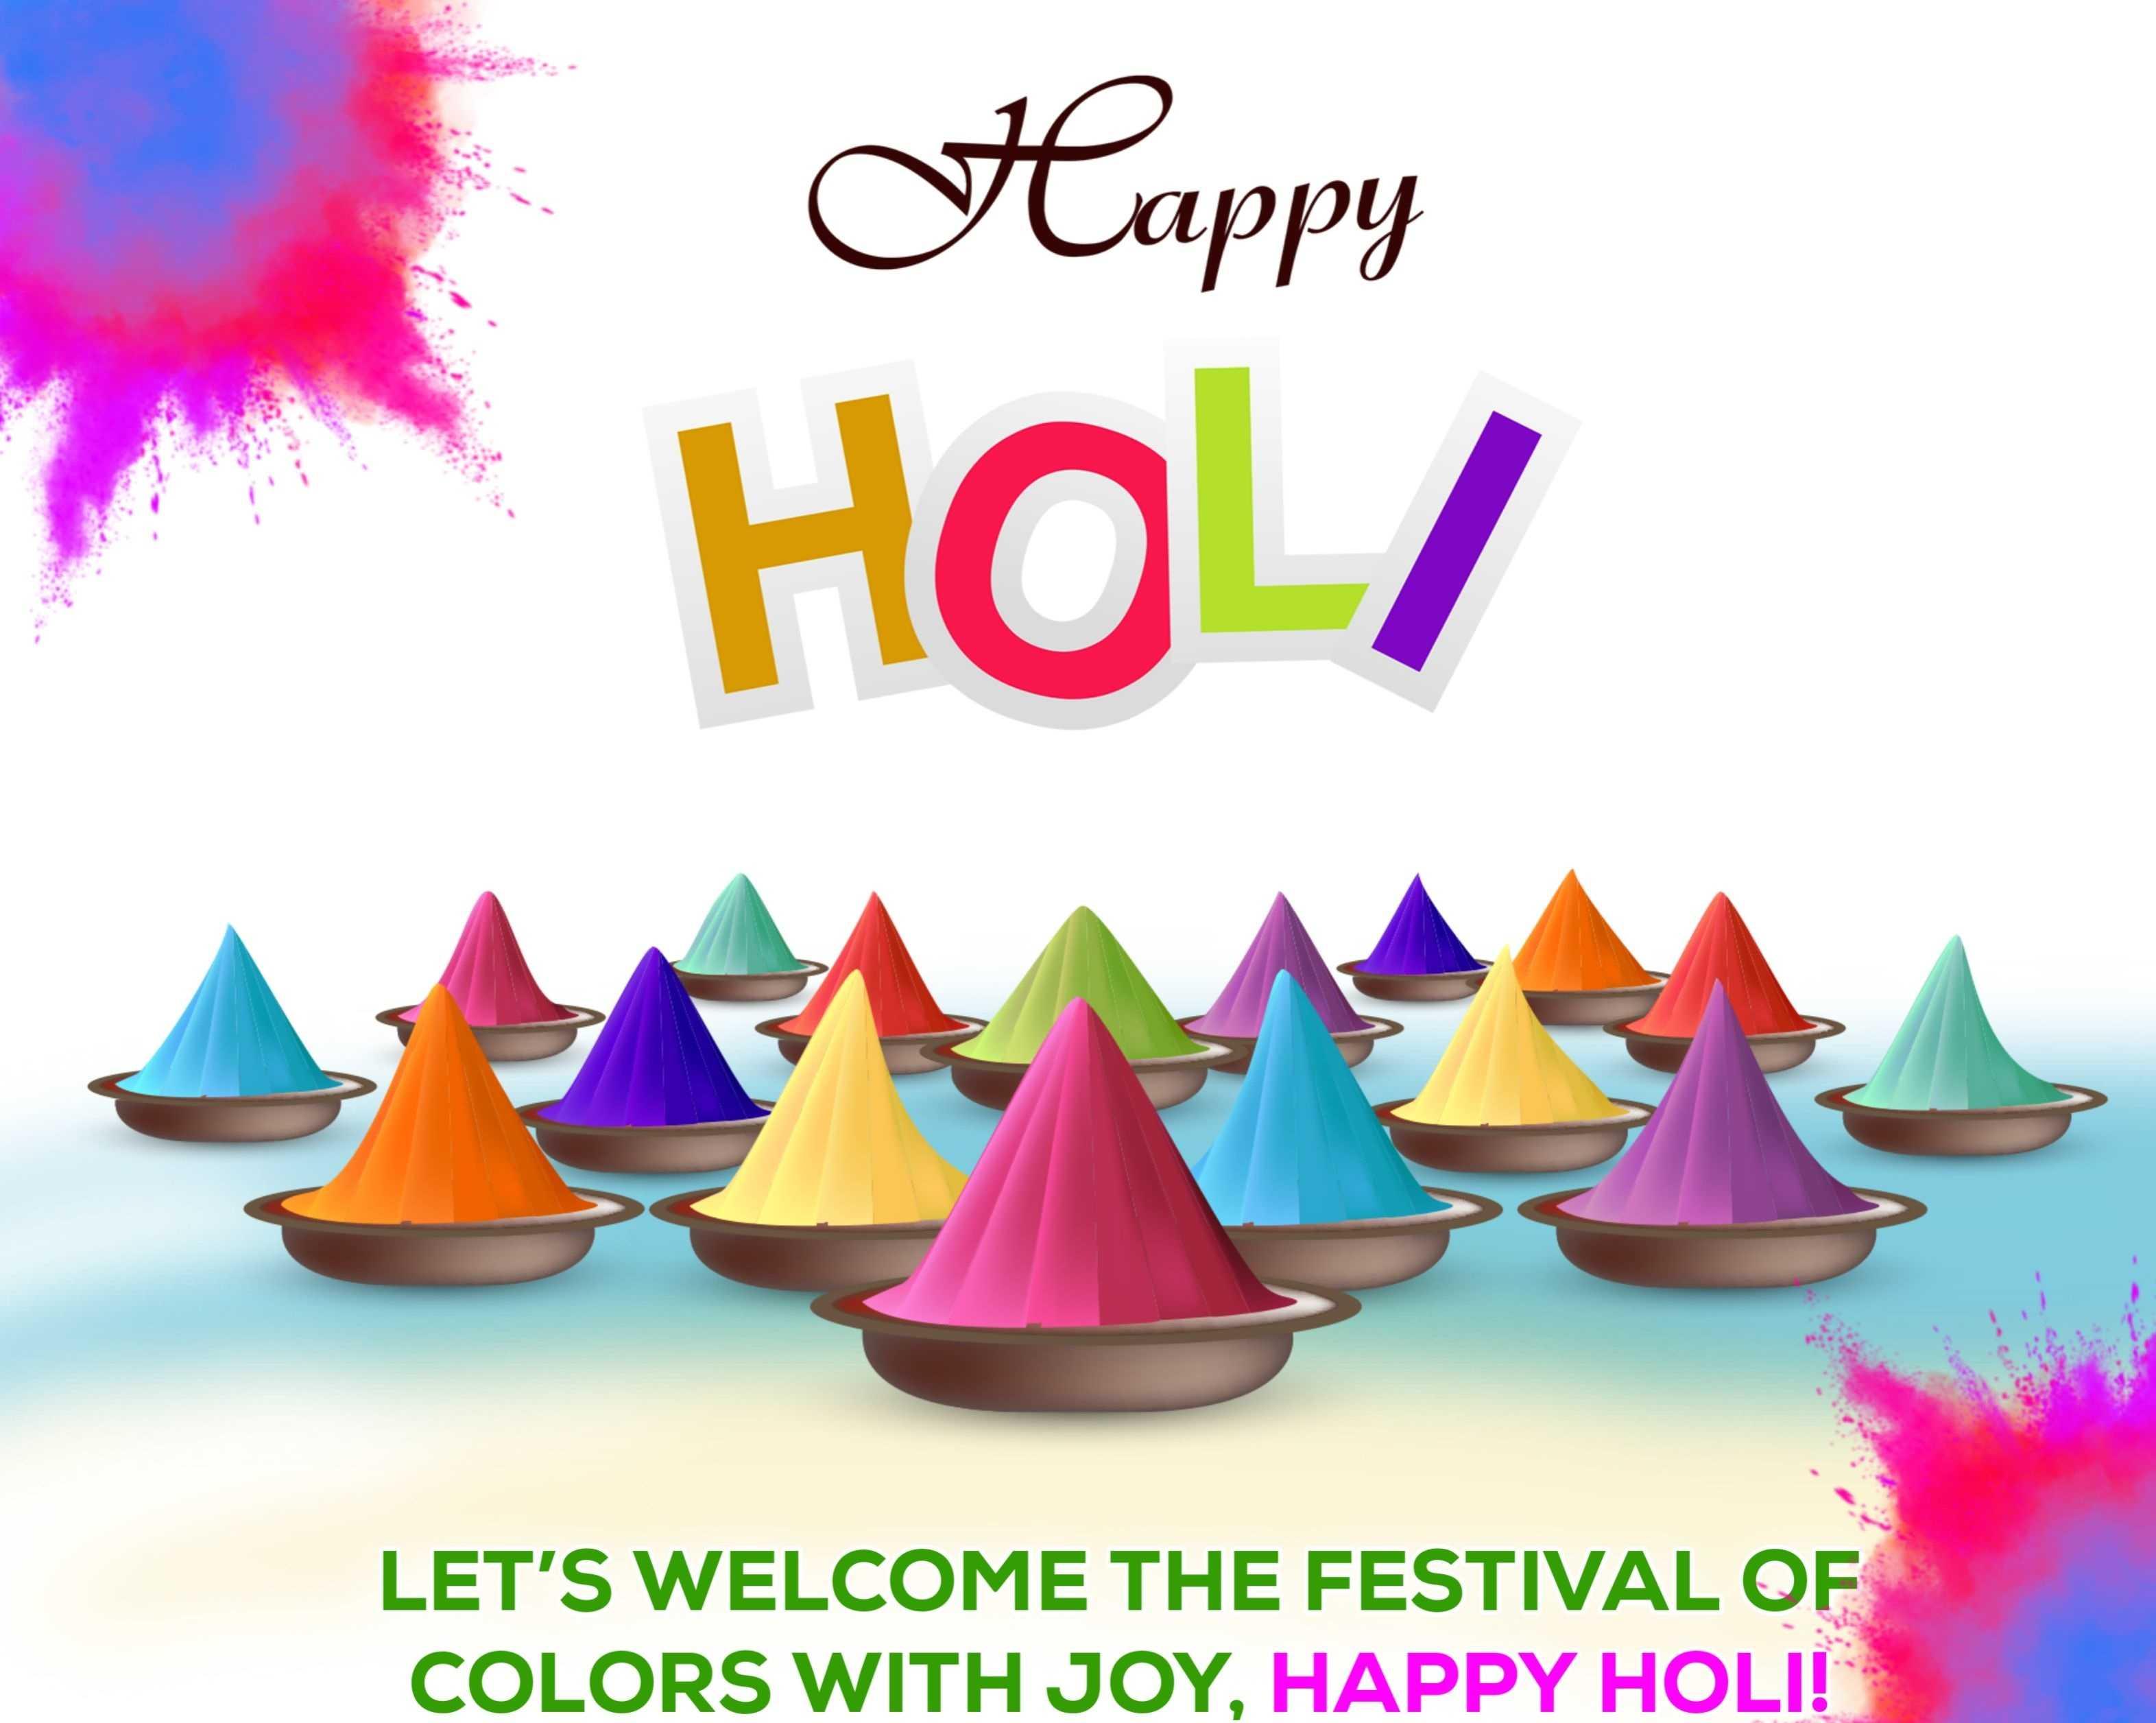 Happy Holi Images 2021 Full Hd Quality - Happy Holi Images 2021 Full Hd Quality